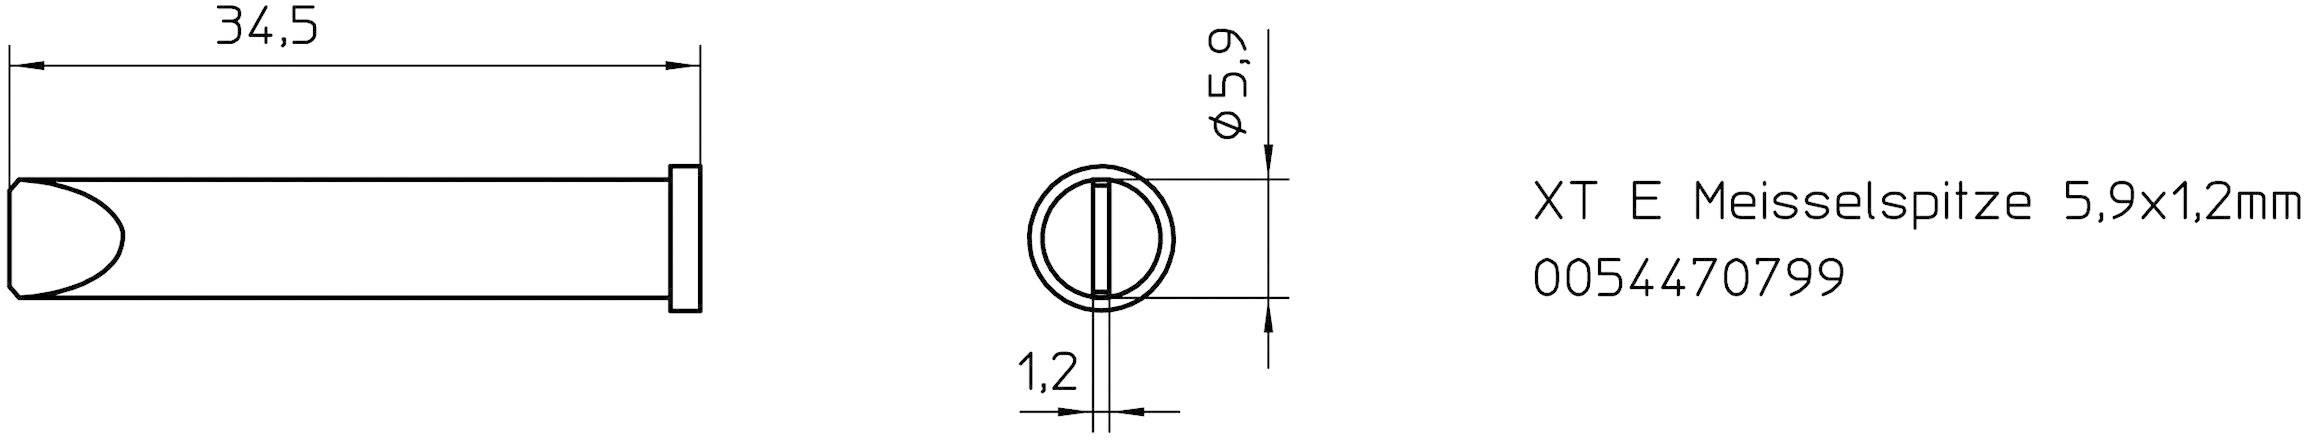 Spájkovací hrot dlátová forma Weller Professional XT-E, velikost hrotu 5.9 mm, 1 ks